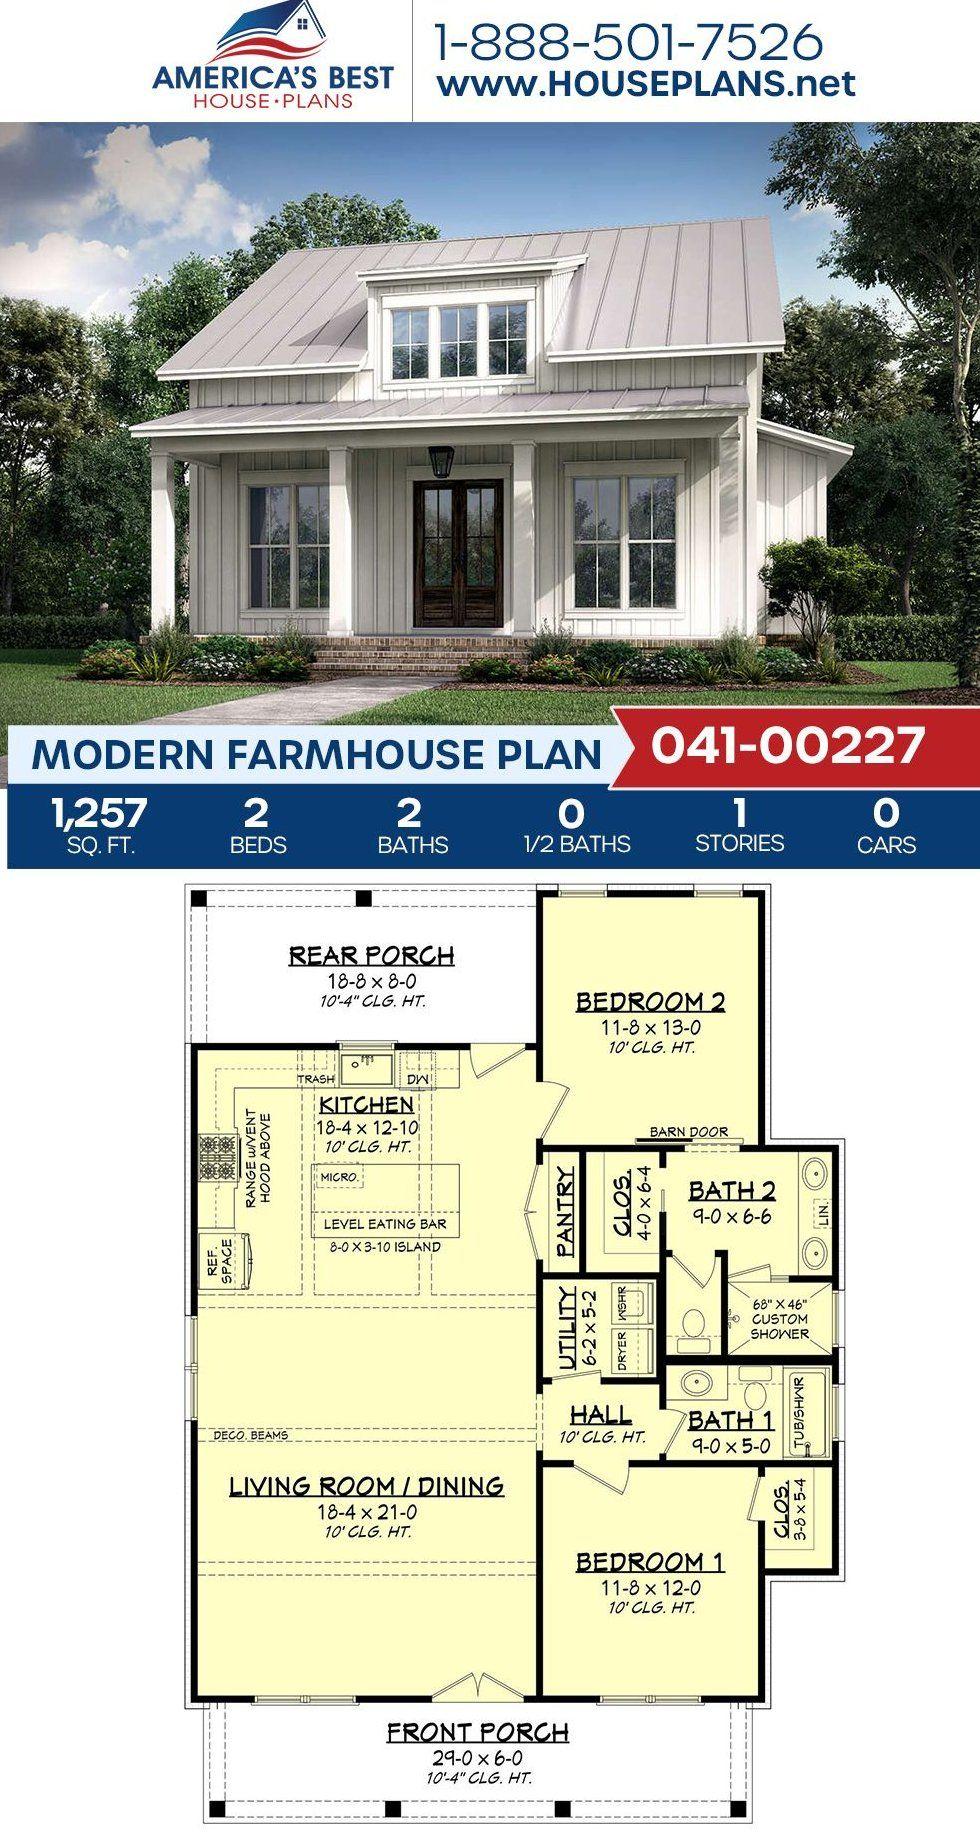 Modern Farmhouse Plan 041 00227 House Plan In 2020 Guest House Plans Modern Farmhouse Plans Small Farmhouse Plans